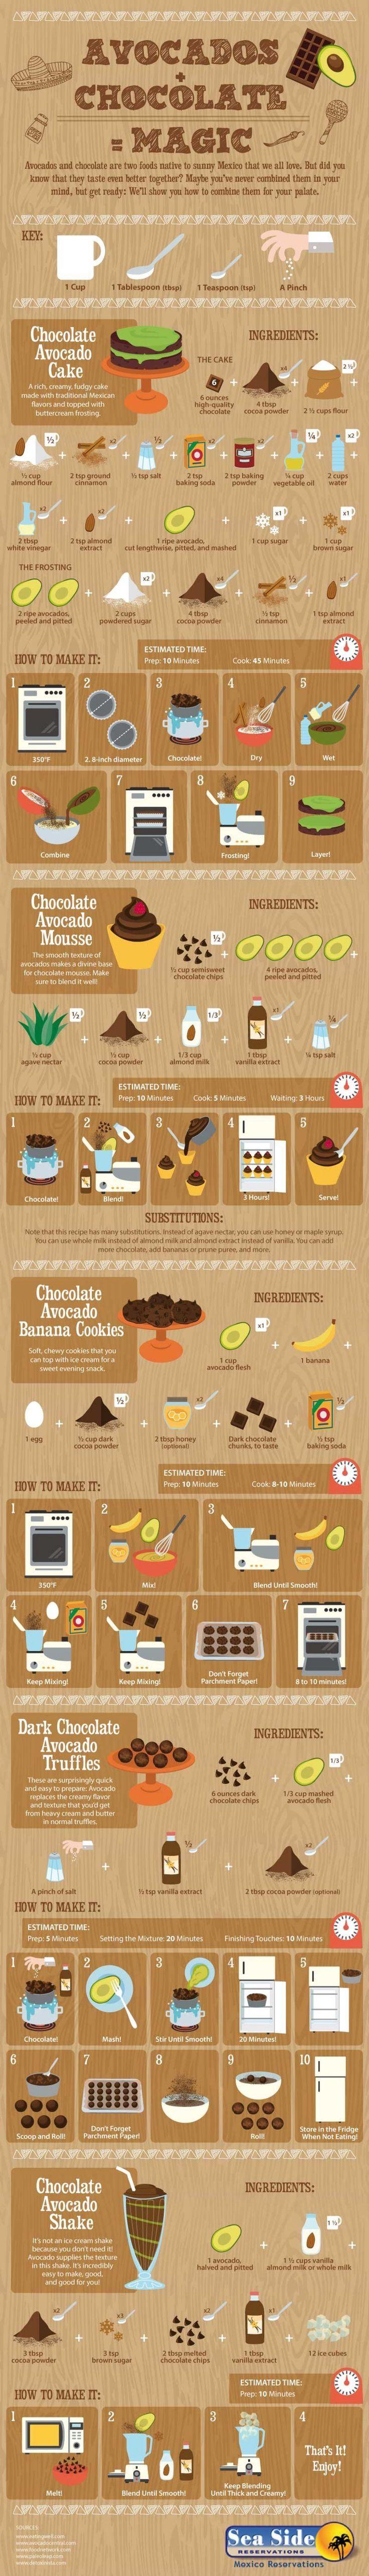 ricette con avocado e cioccolato